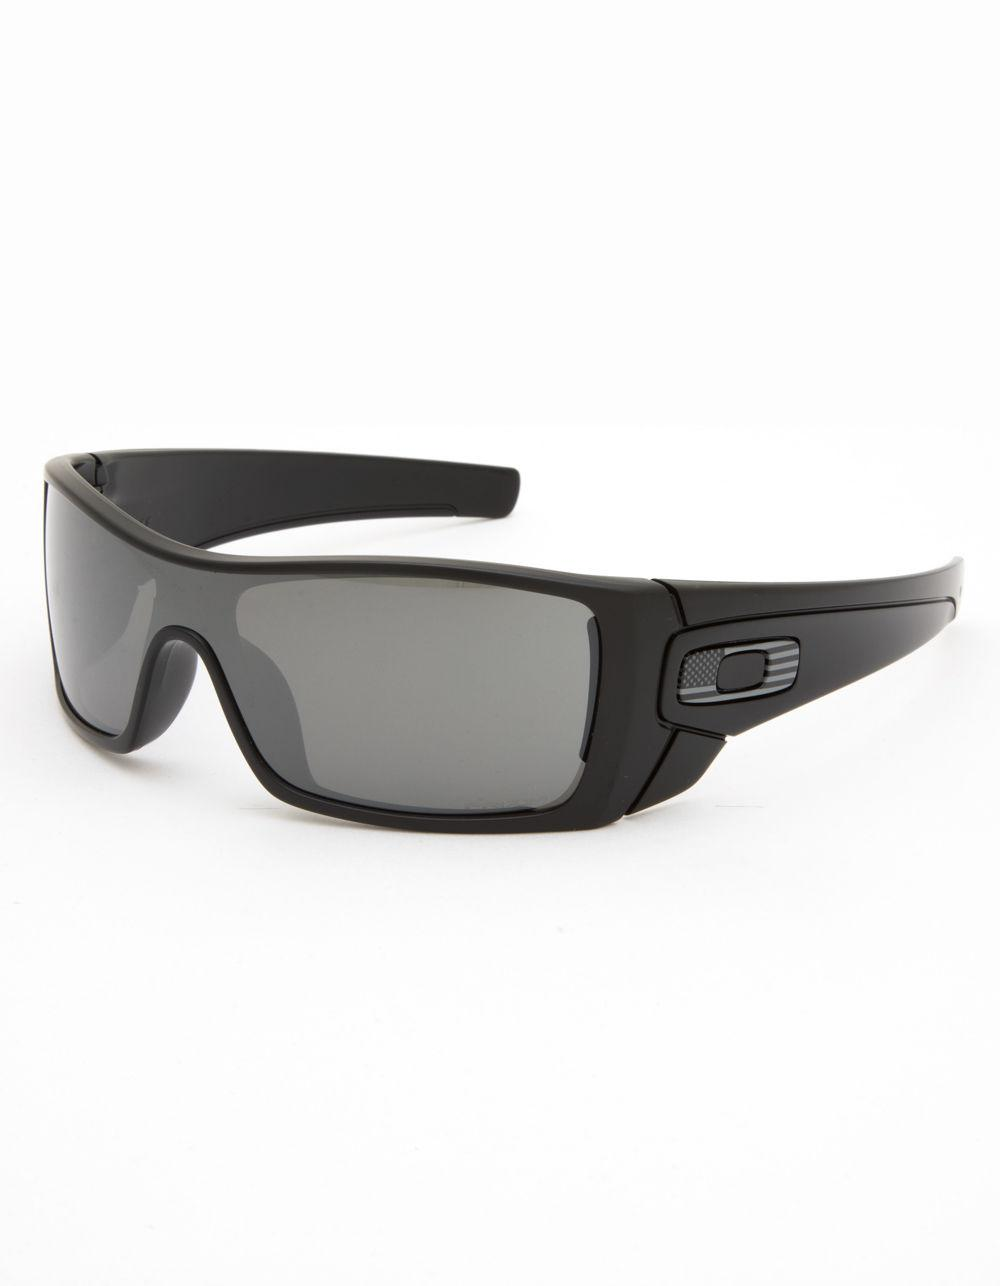 69ad7e26afef7 ireland oakley sunglasses batwolf granite d75b0 aedf7